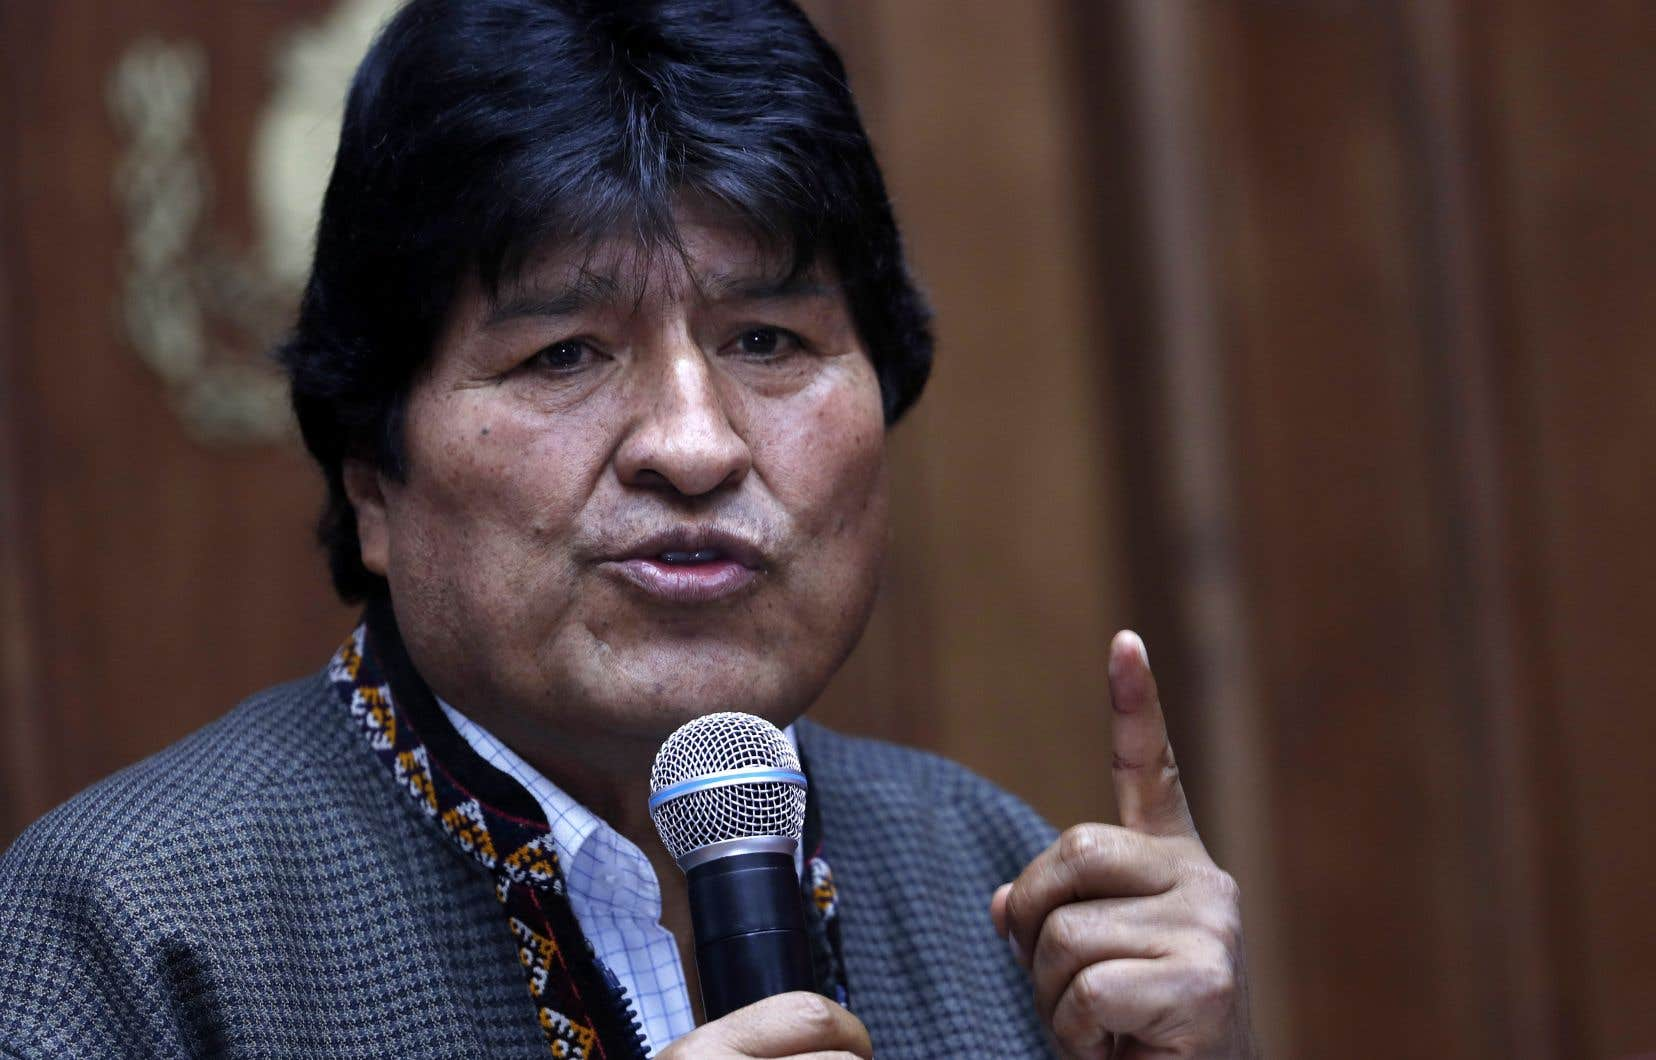 L'ex-président de la Bolivie, Evo Morales